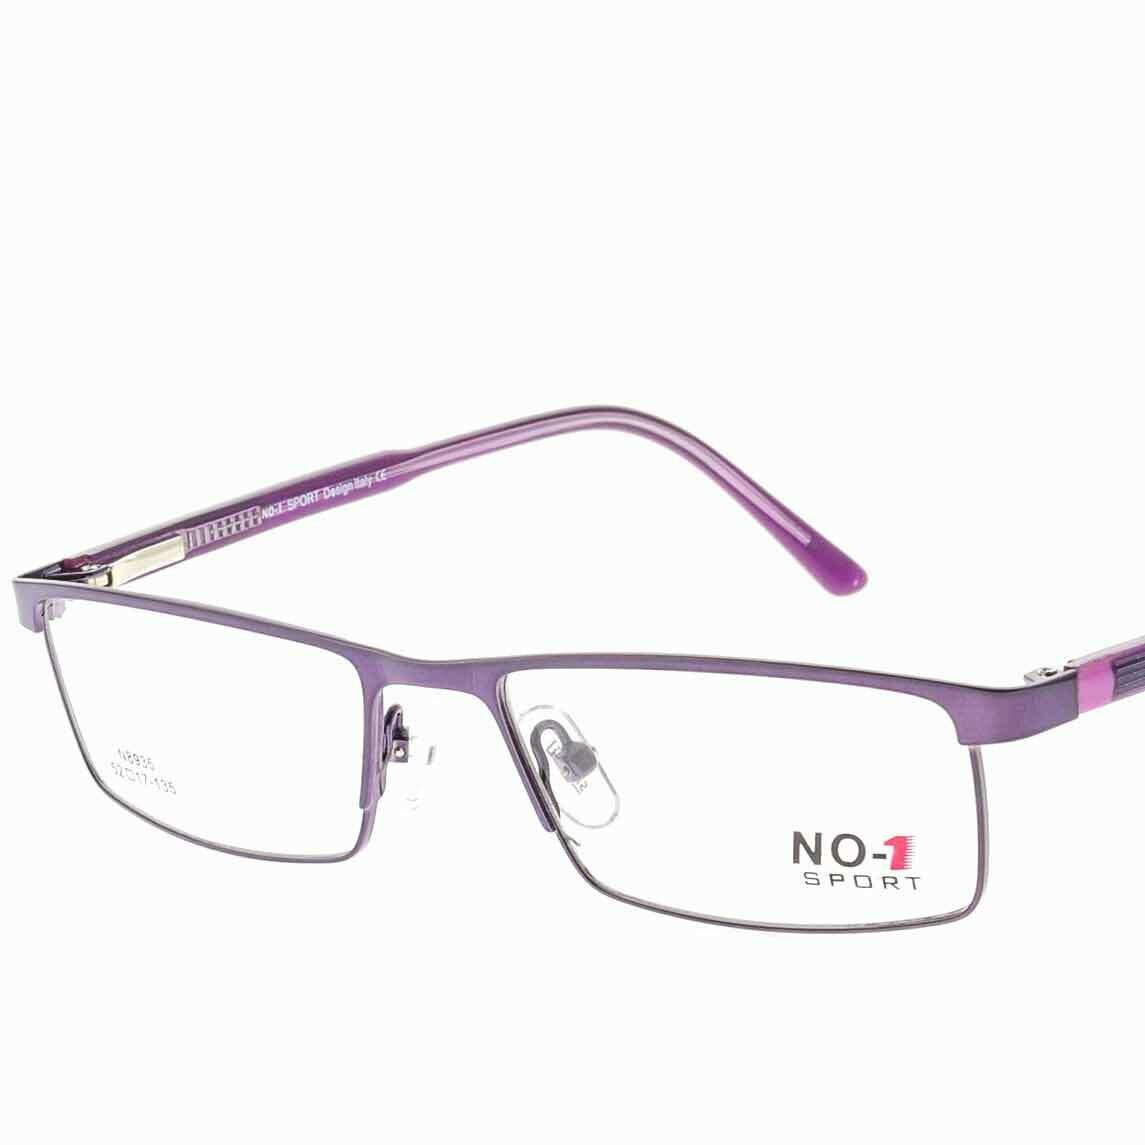 NO-1 SPORT N8935